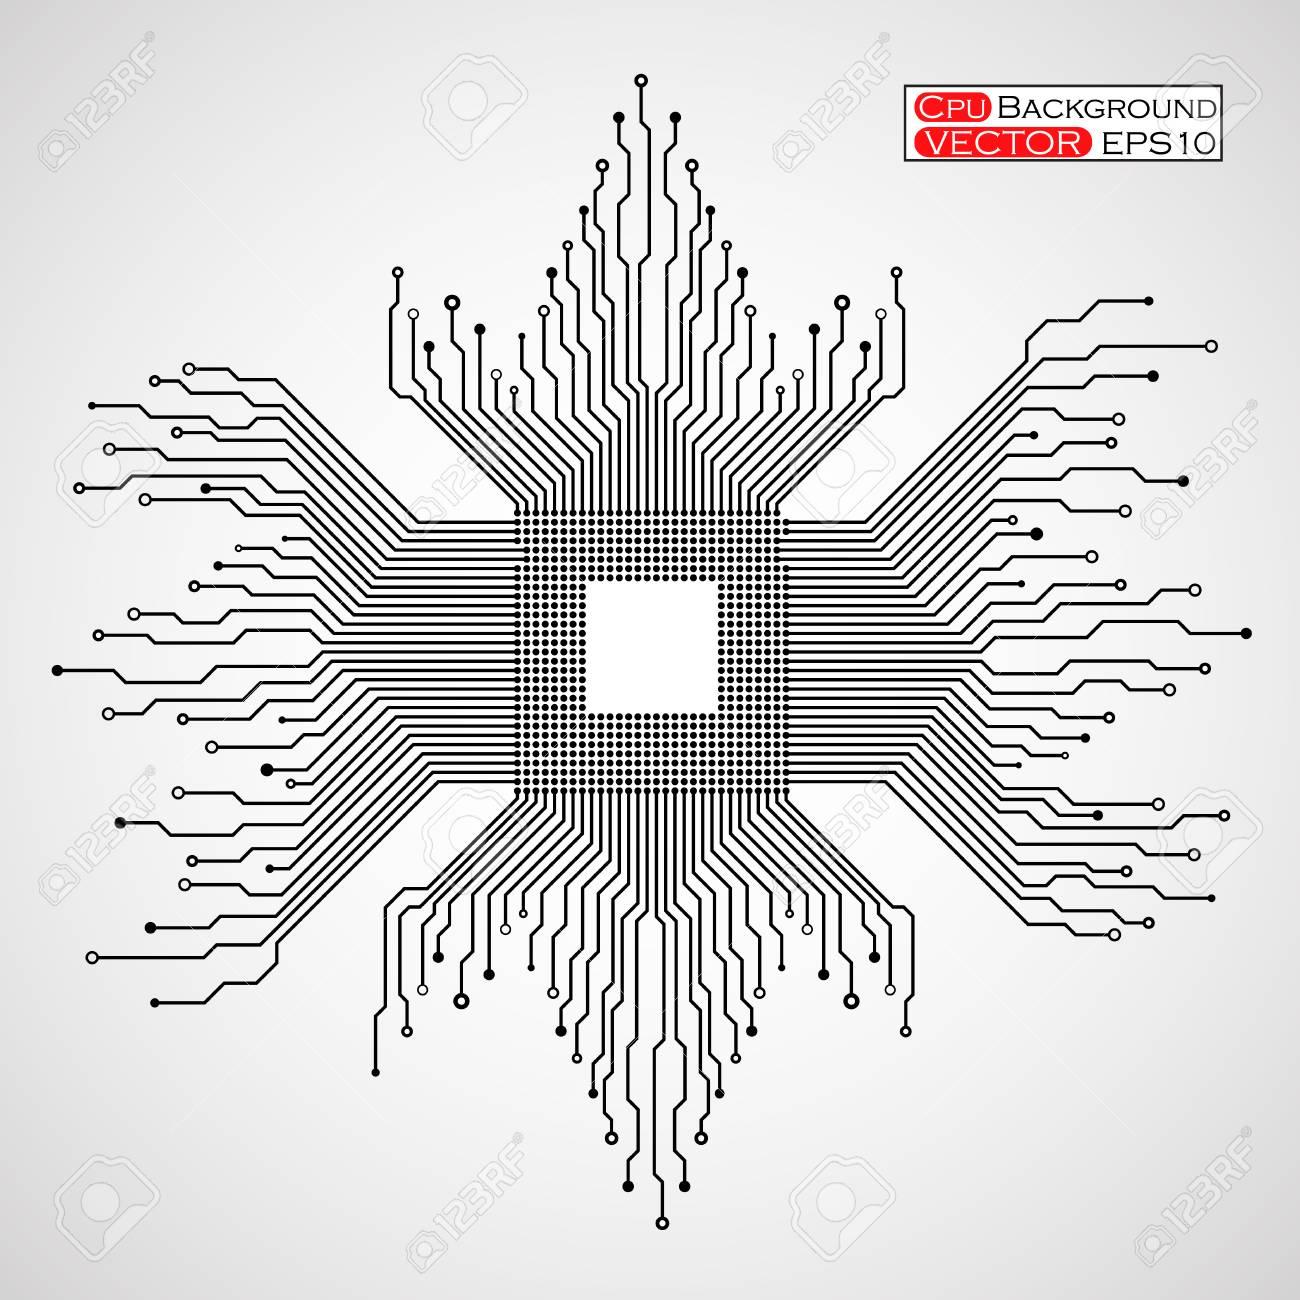 Illustration De La Carte De Circuit Imprimé. Clip Art Libres De ...